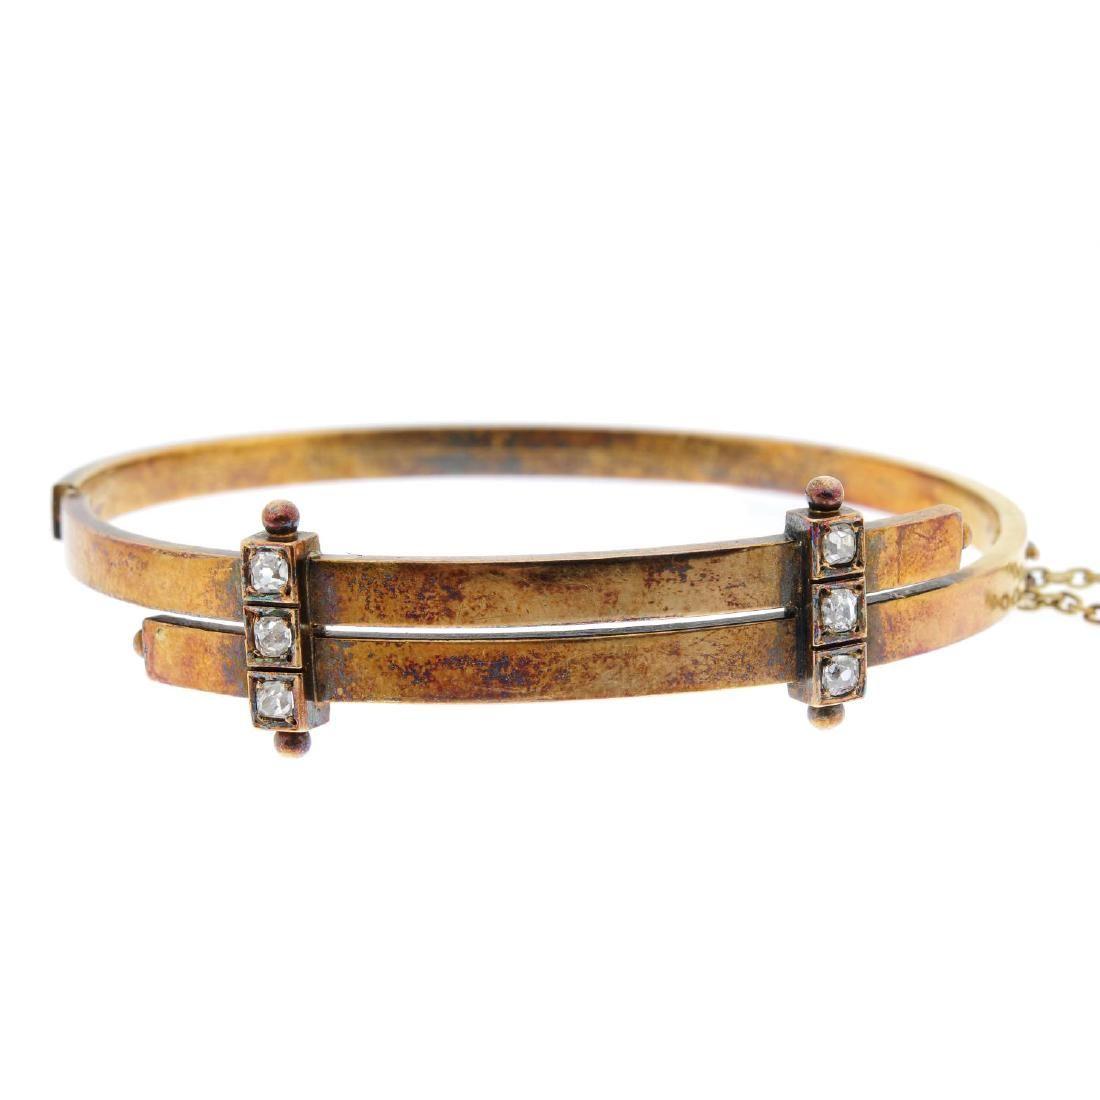 A late Victorian 15ct gold diamond hinged bangle.